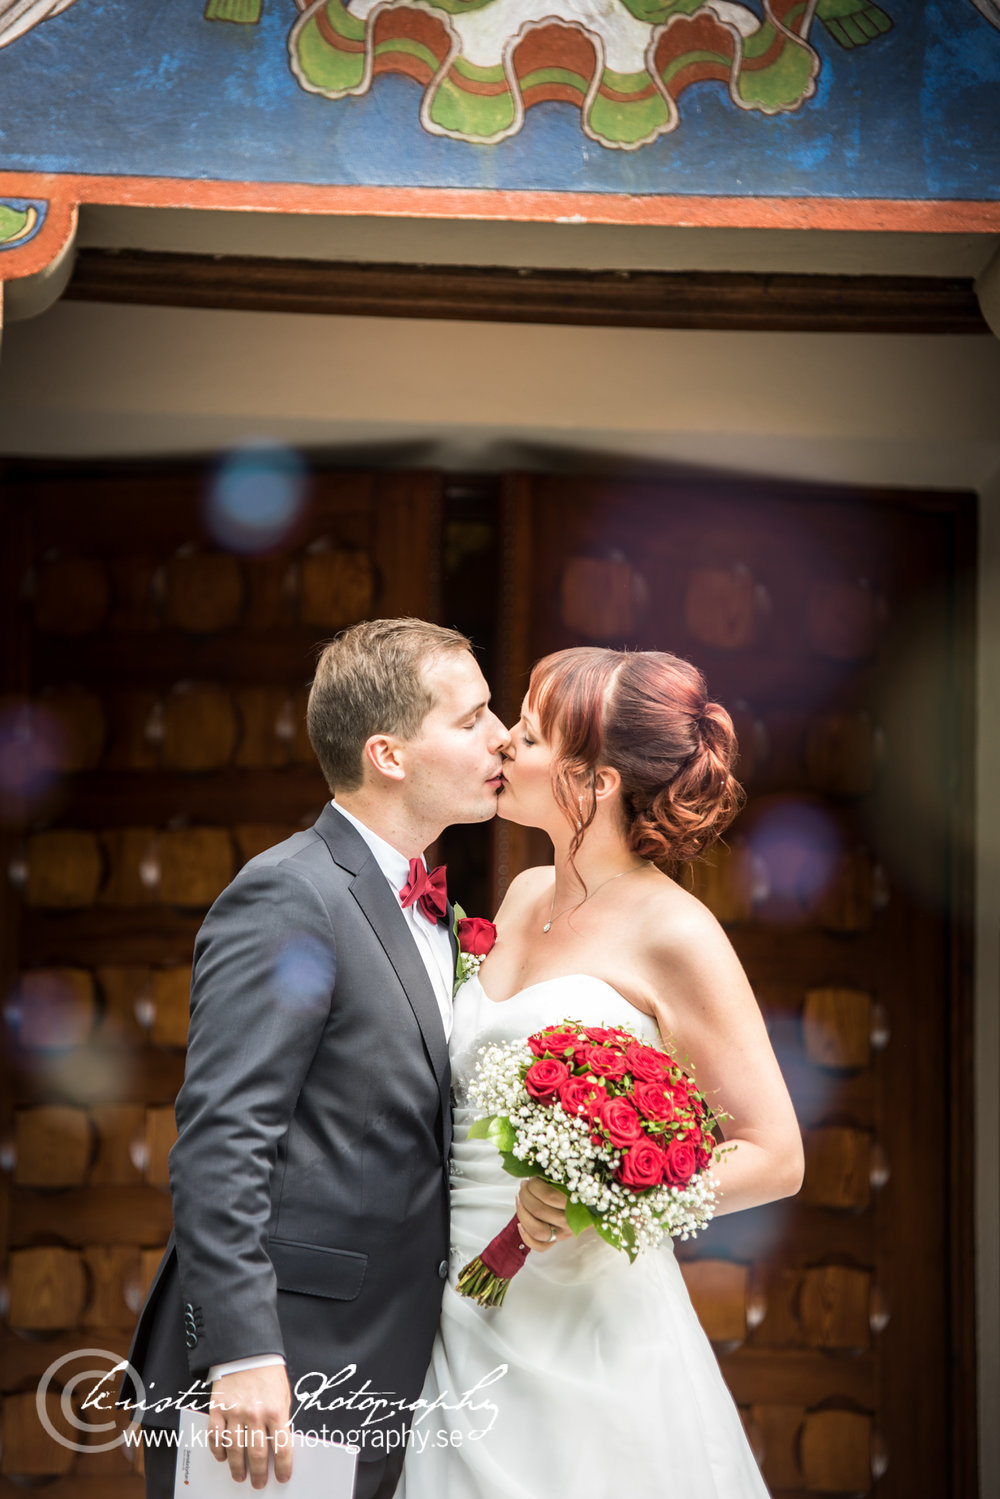 Bröllopsfotograf i Stockholm, Kristin - Photography , Munchen Bryggeriet-145.jpg